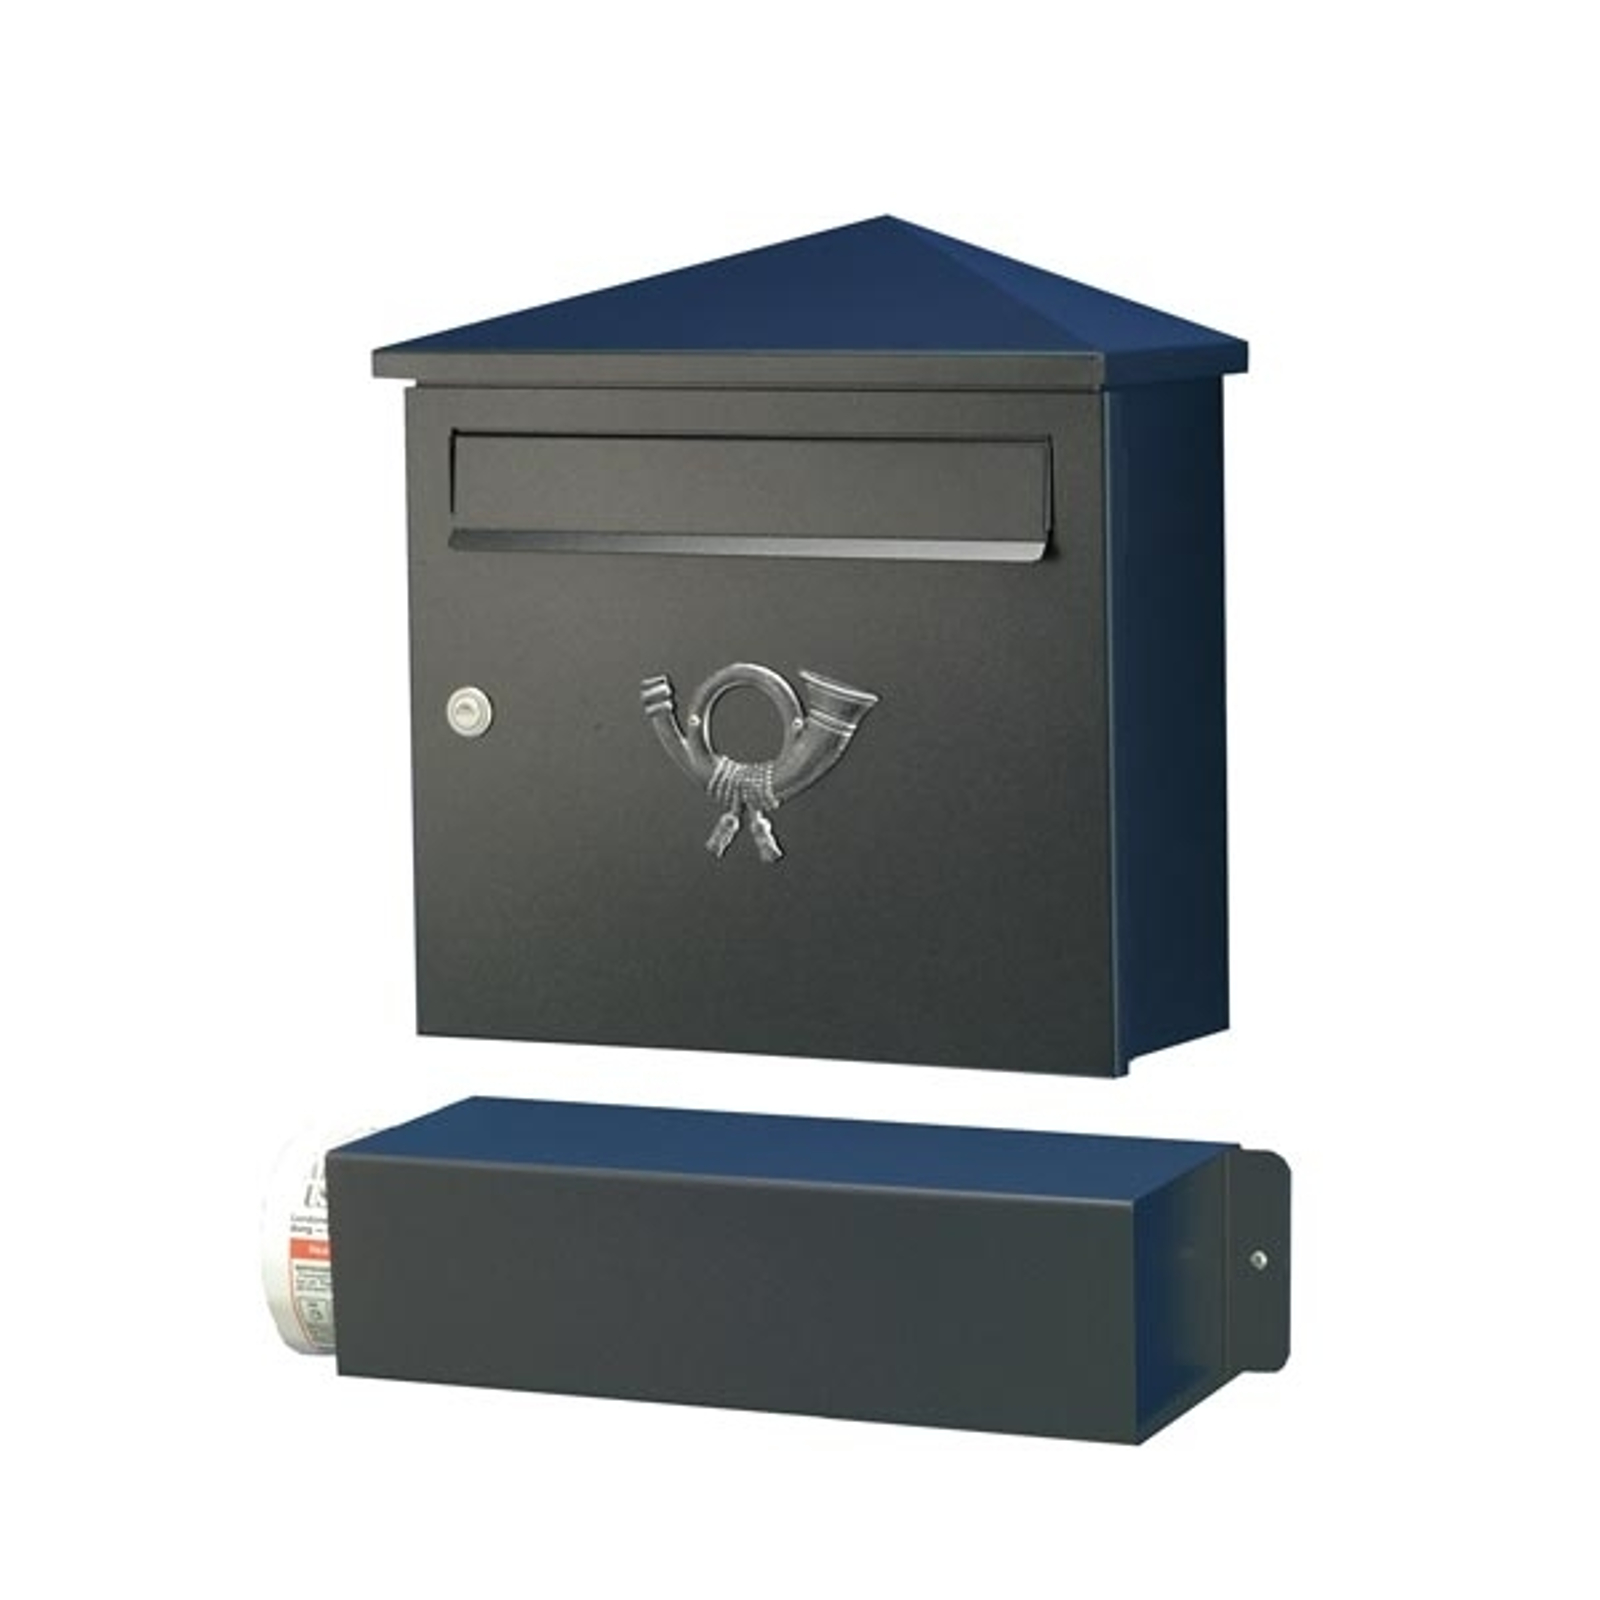 Poštová schránka Lucio čierna